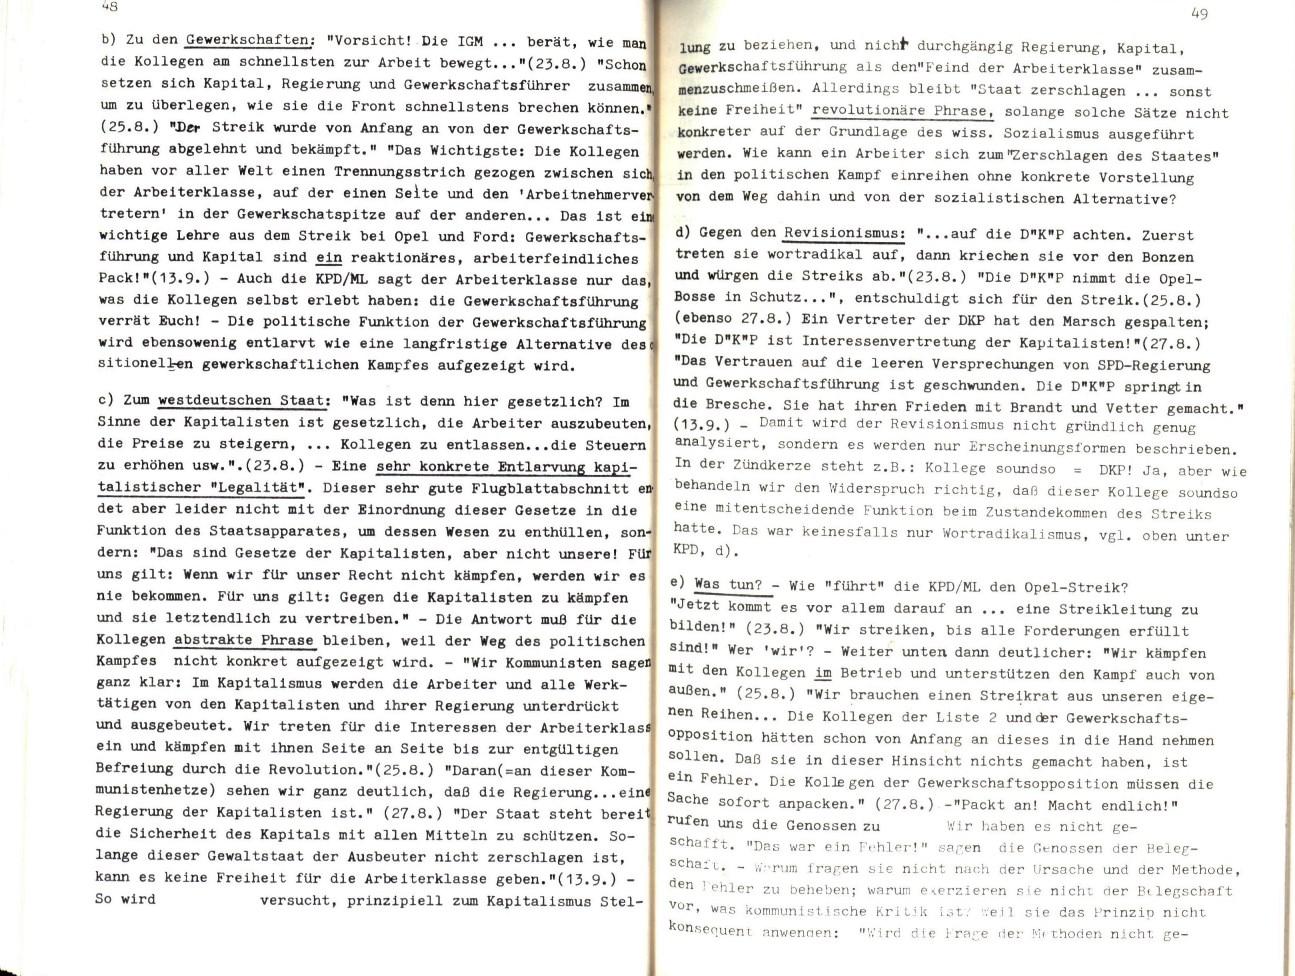 Bochum_IGM_Opel_PG_Opel_streikt_1973_026